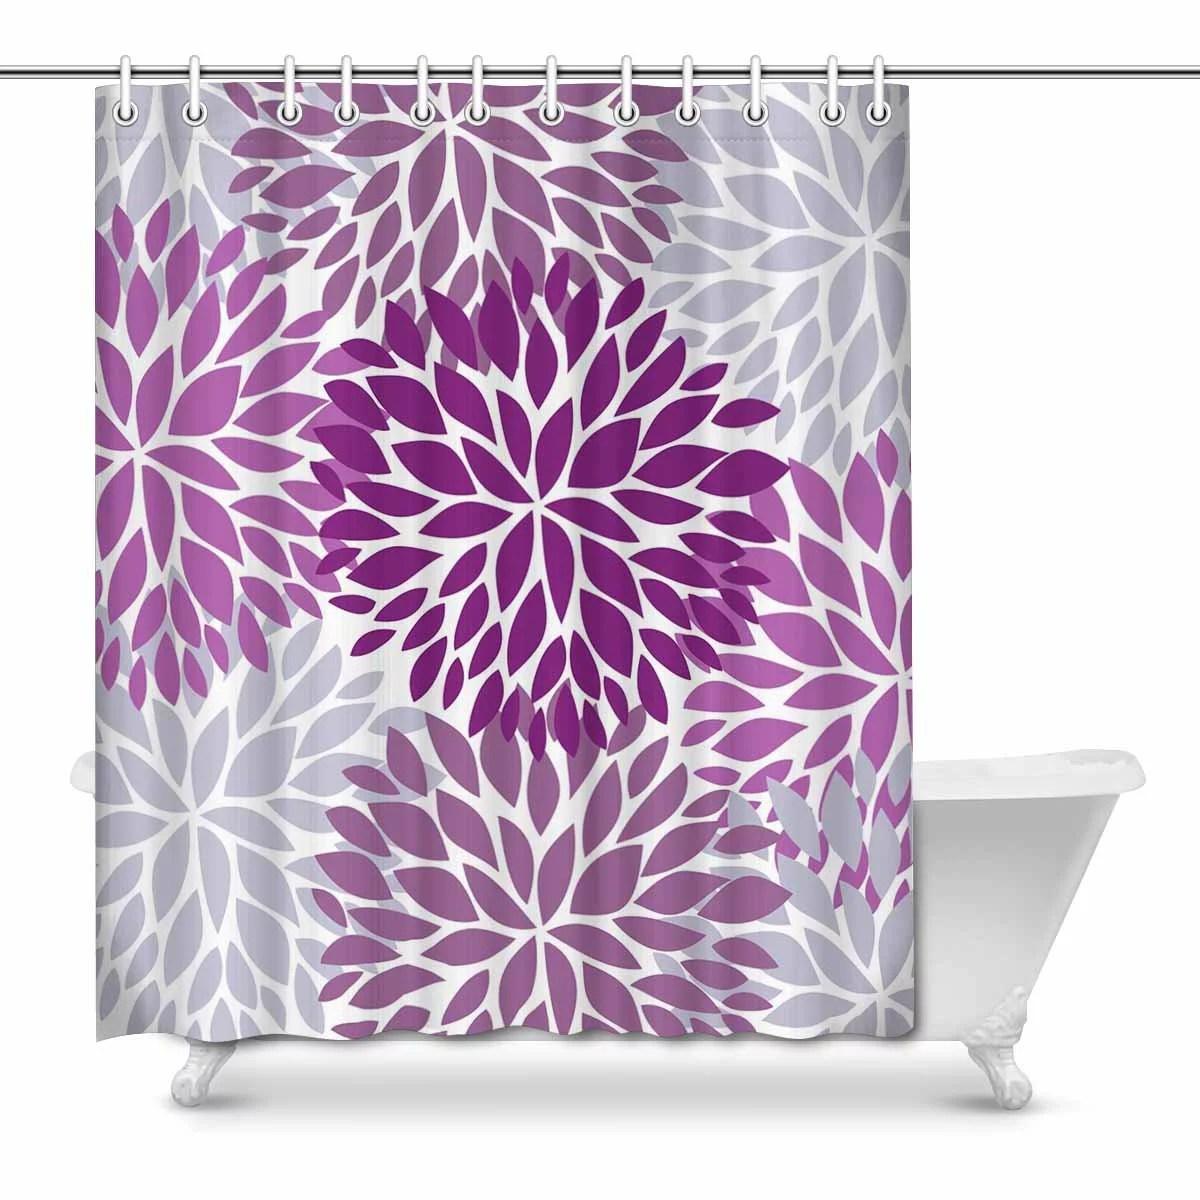 mkhert dahlia pinnata flower purple and gray waterproof shower curtain decor floral fabric bathroom set 66x72 inch walmart com